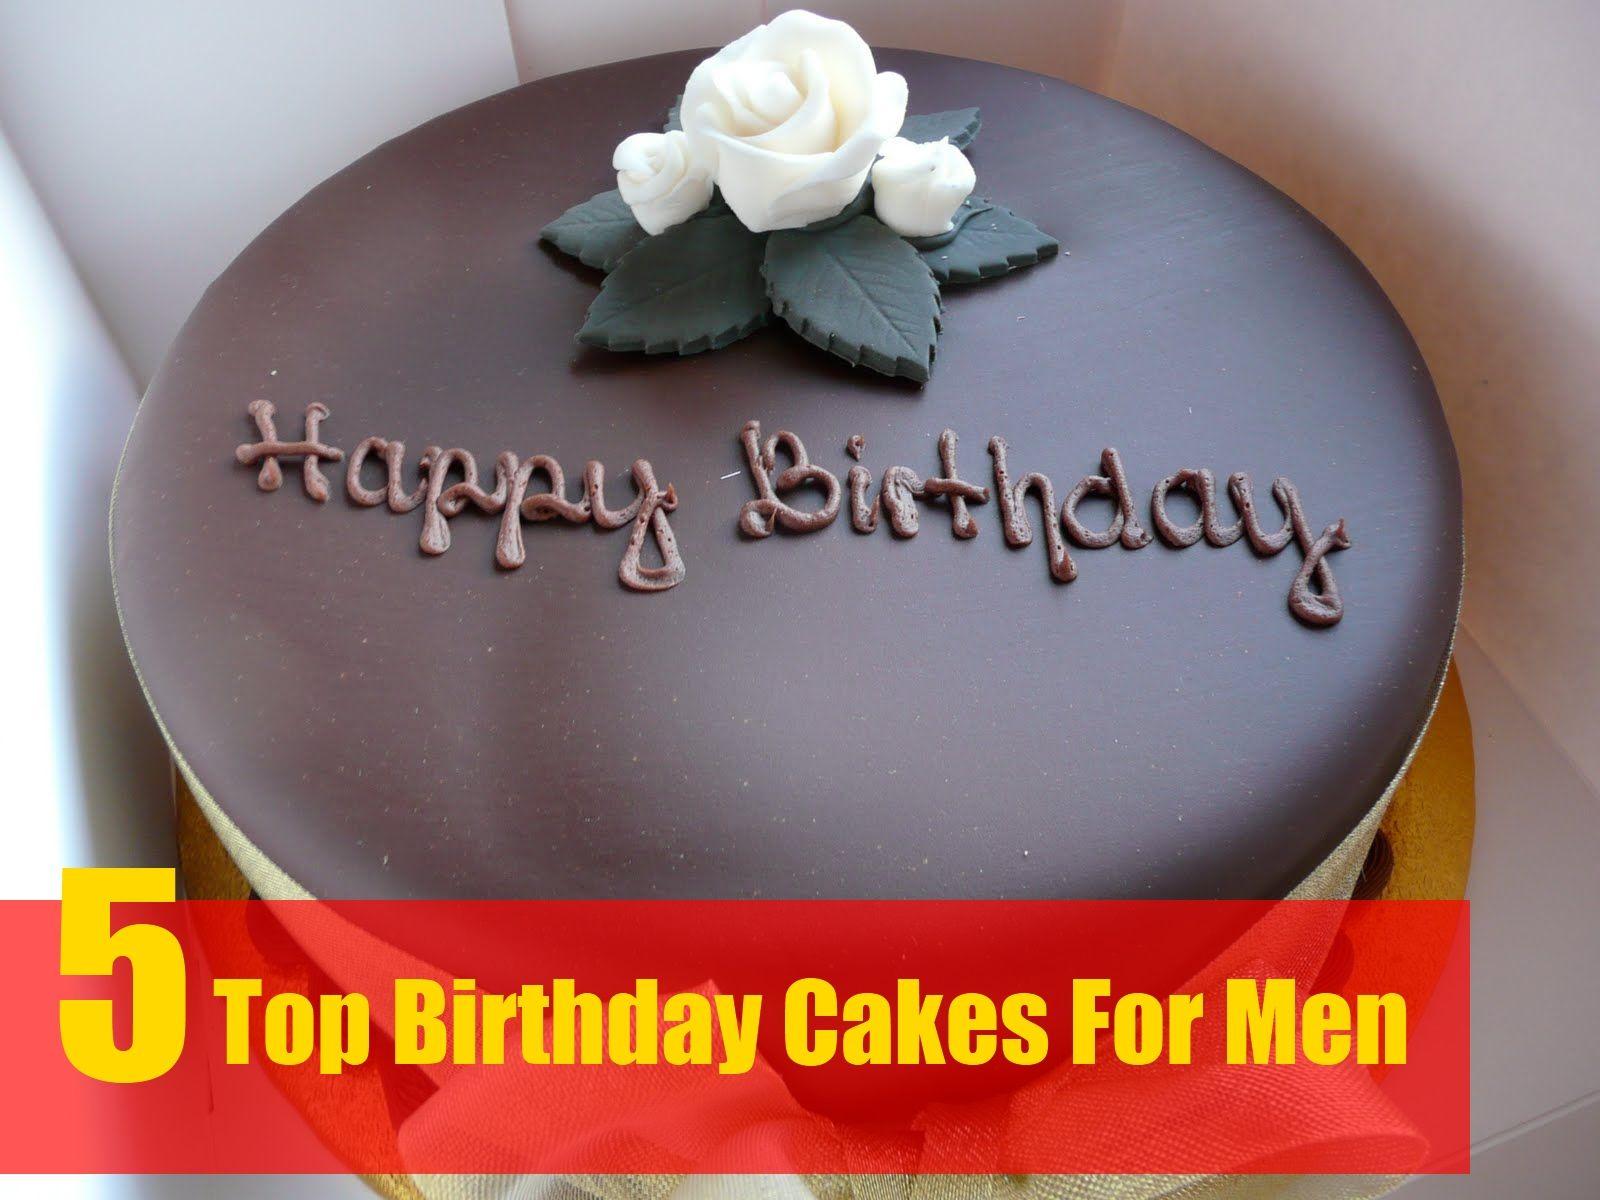 5 Top Birthday Cakes For Men